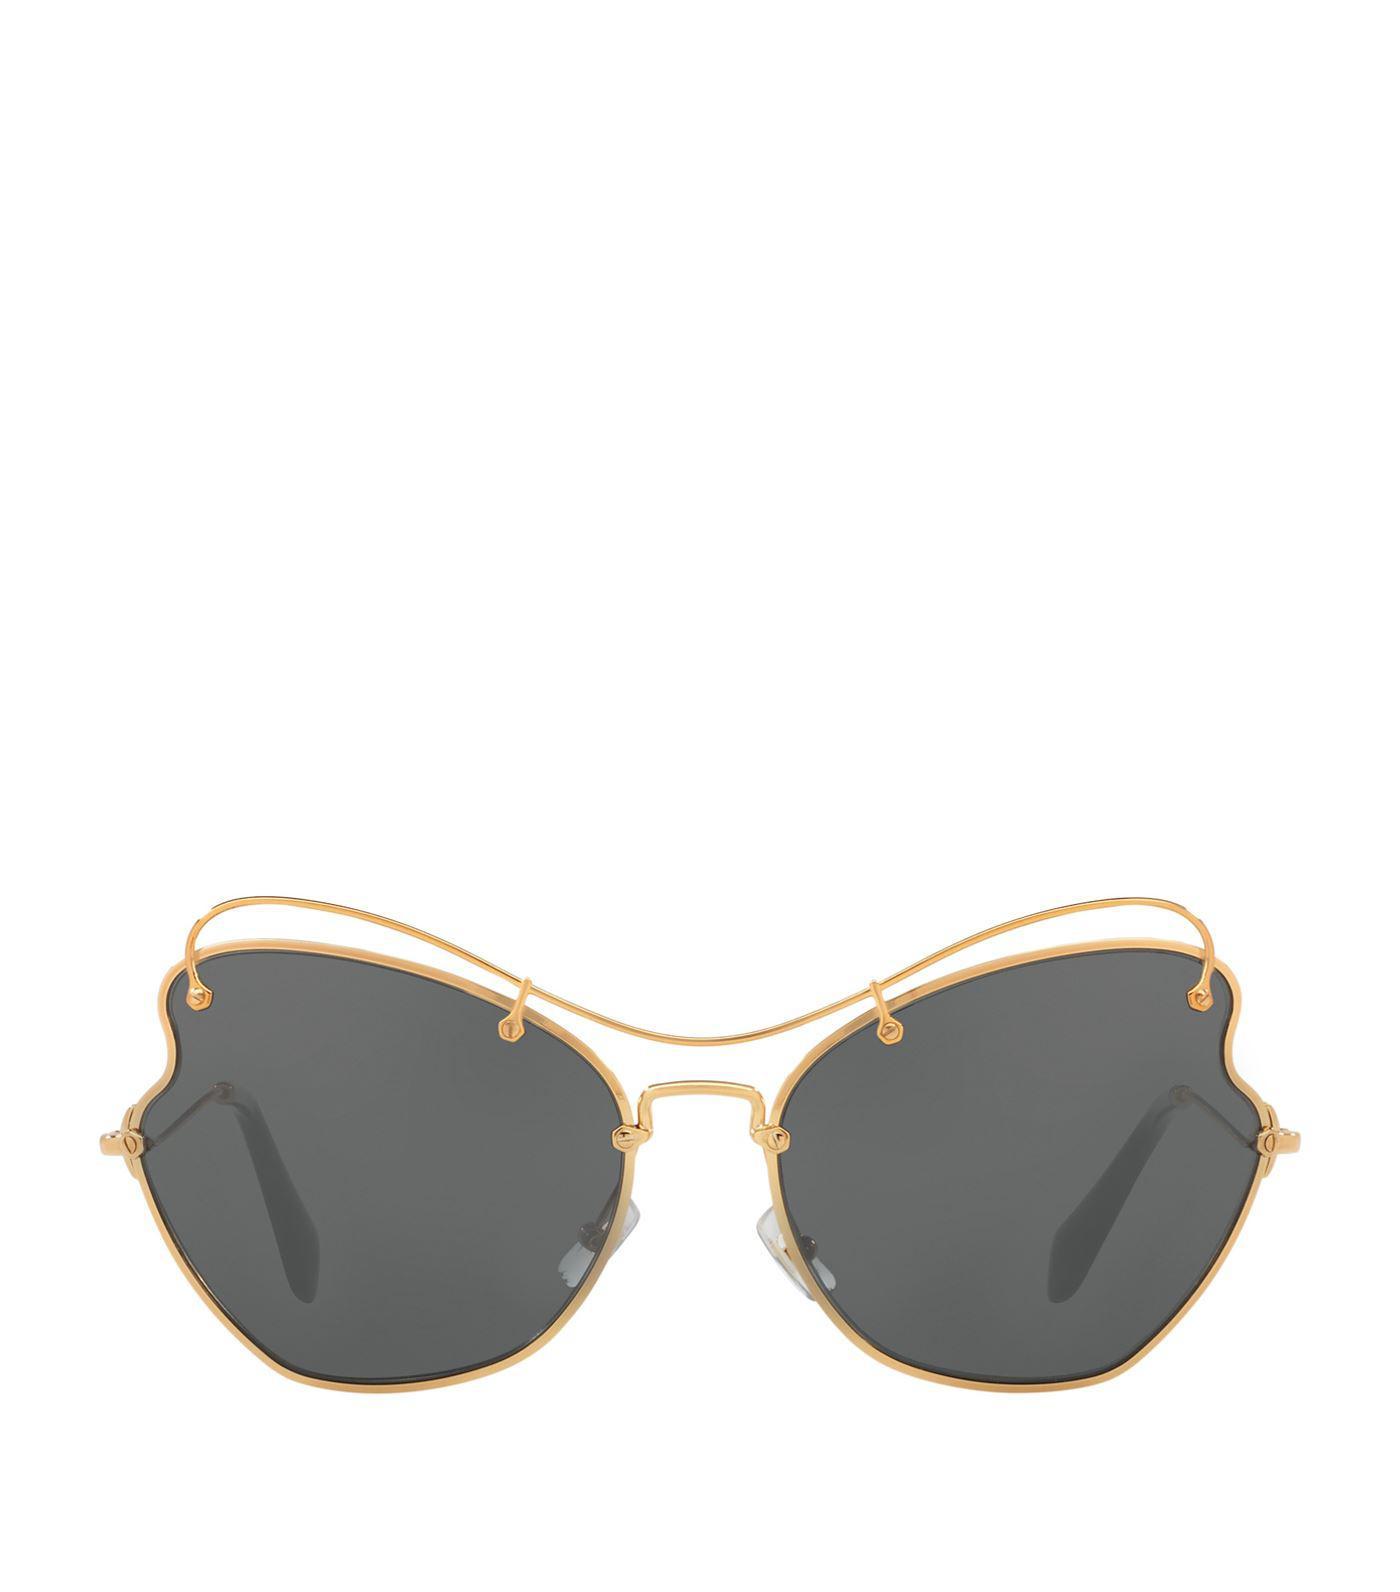 dc82fb96c016 Lyst - Miu Miu Metal Irregular Sunglasses in Metallic